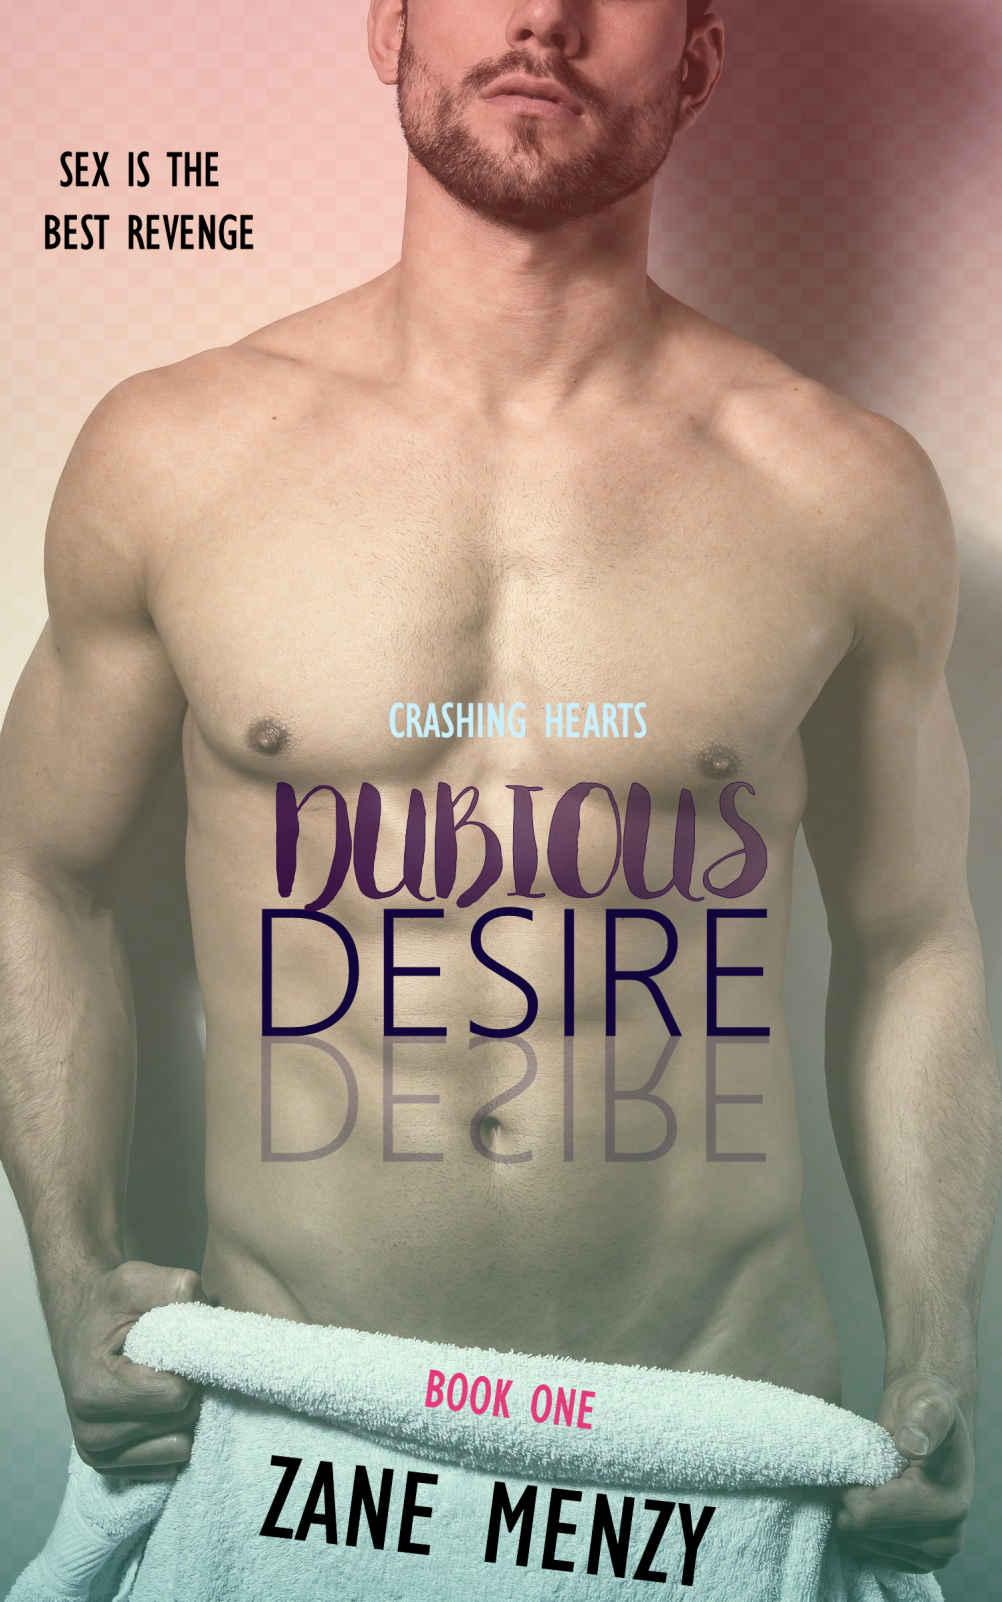 Dubious Desire cover image